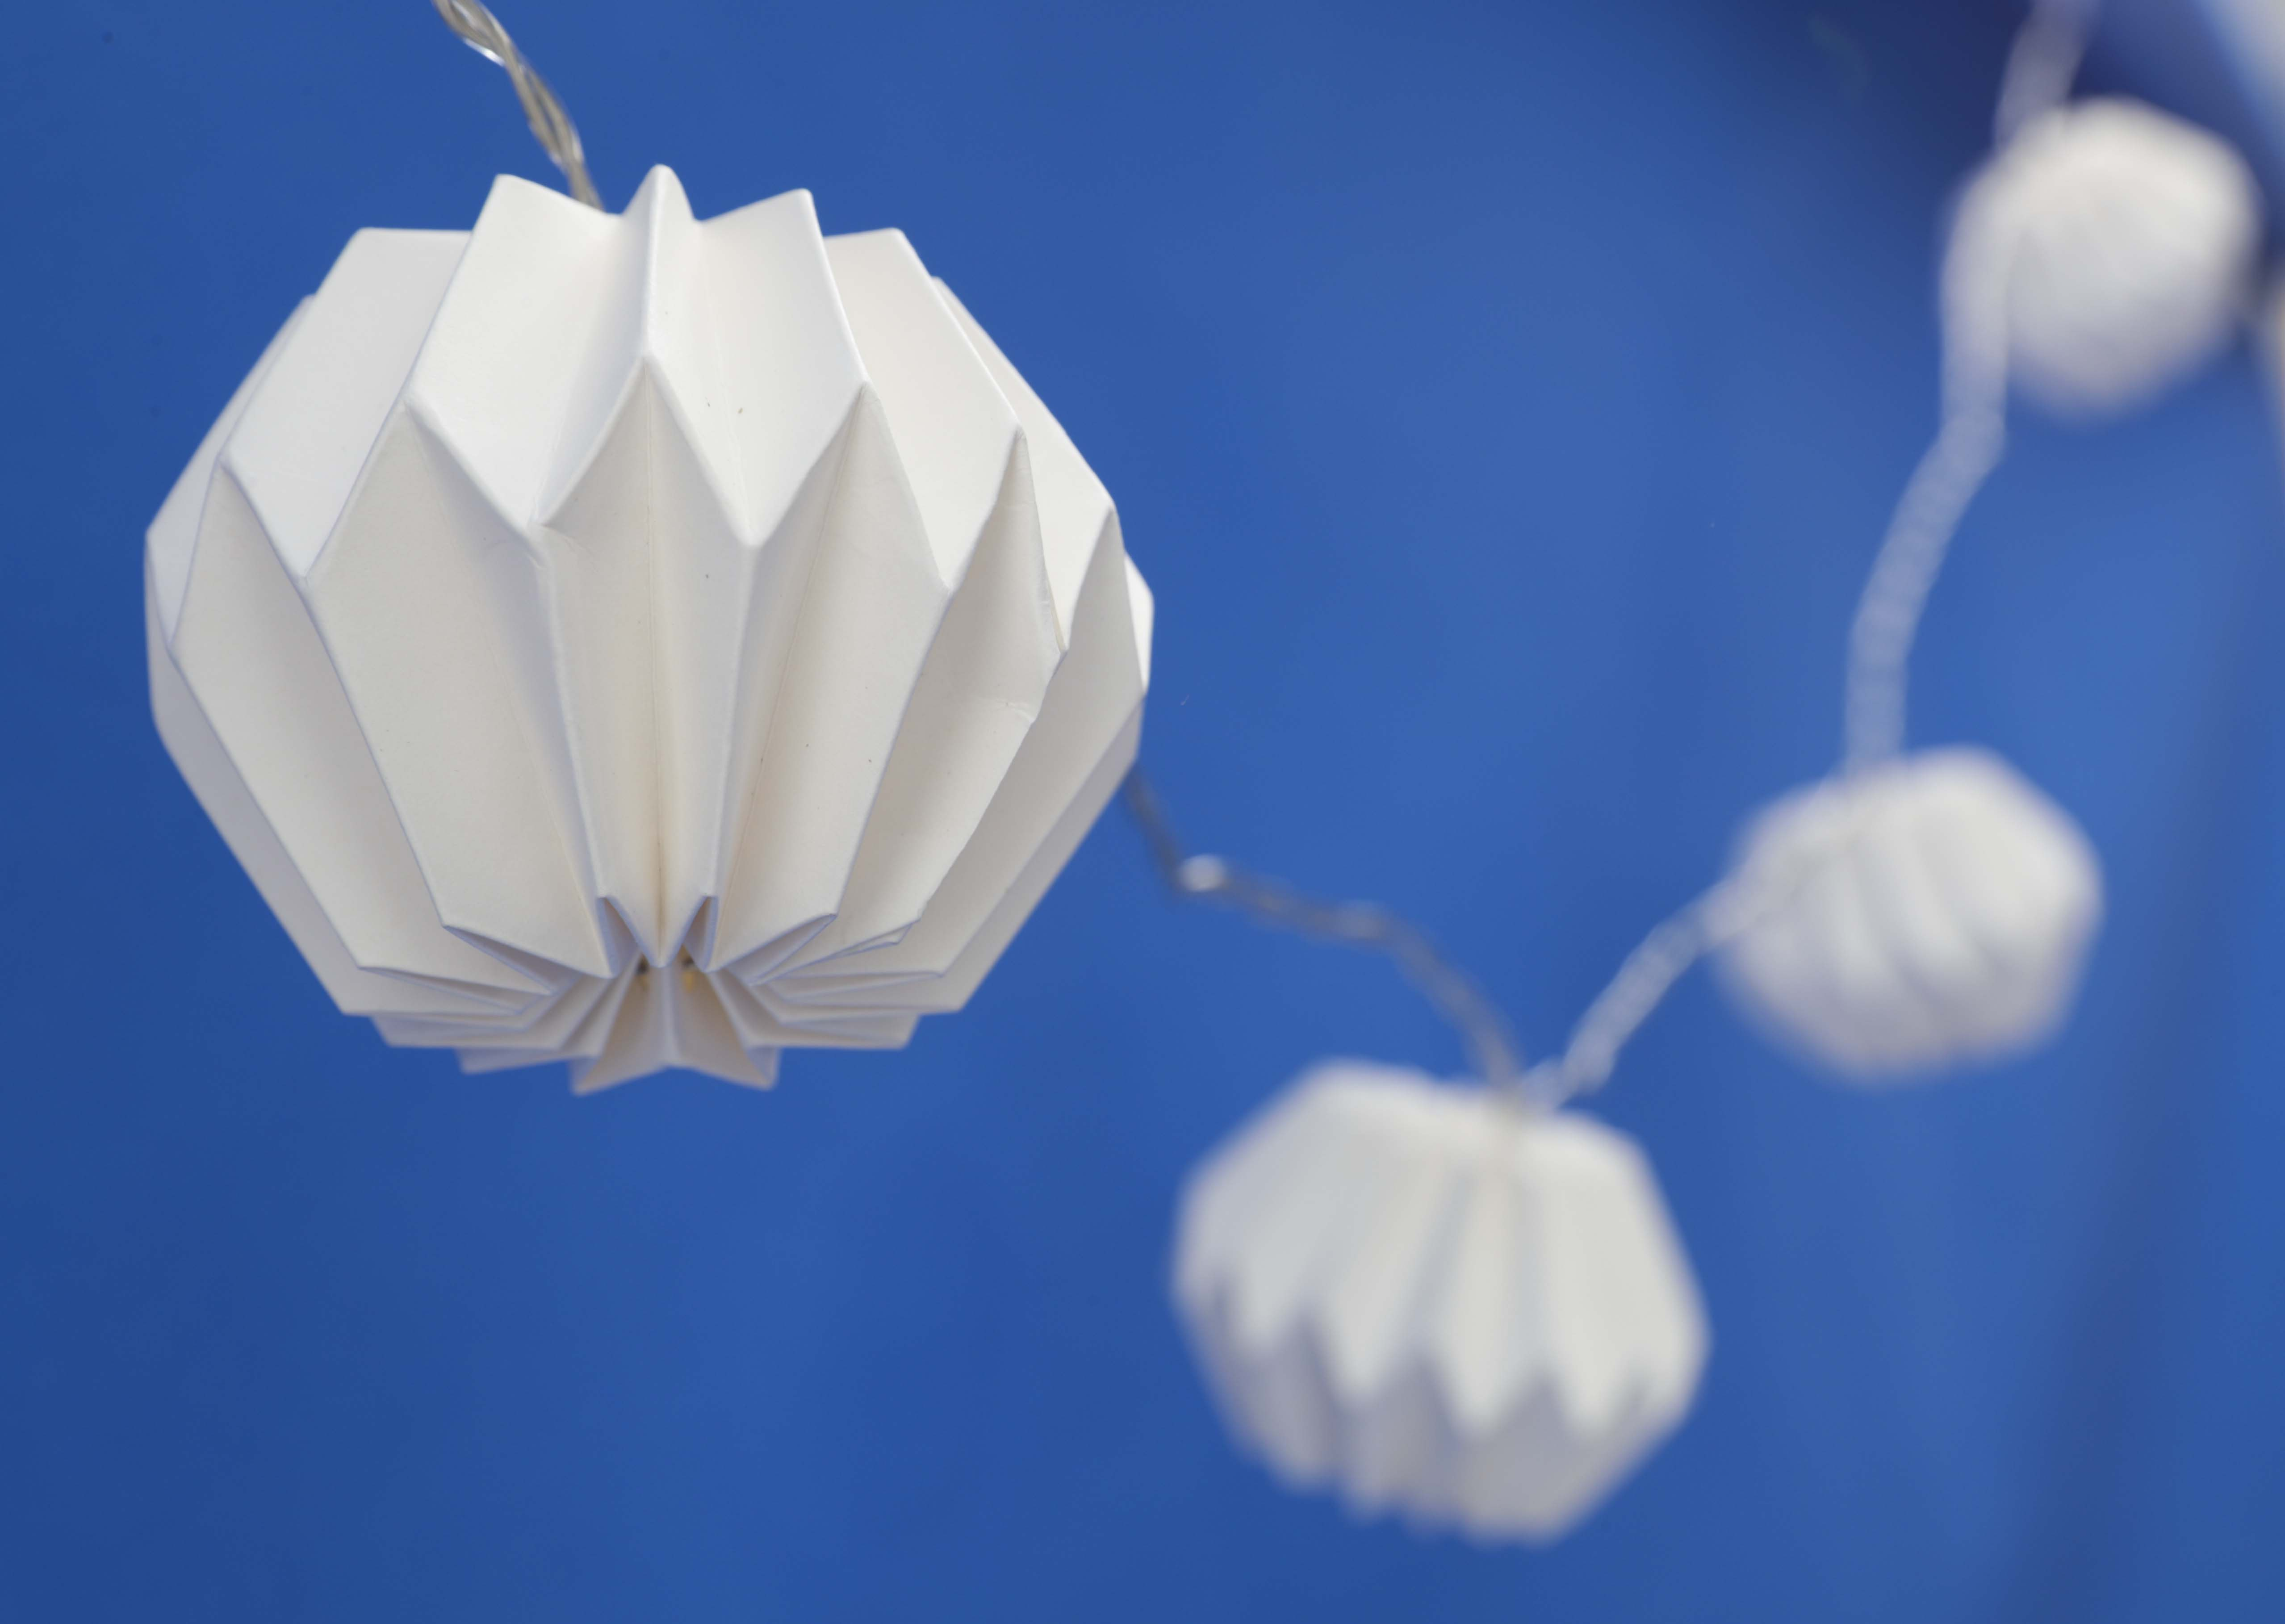 Guirnaldas con luces para exterior, de Bed, Bath and Beyond (Foto Wanda Liz Vega)